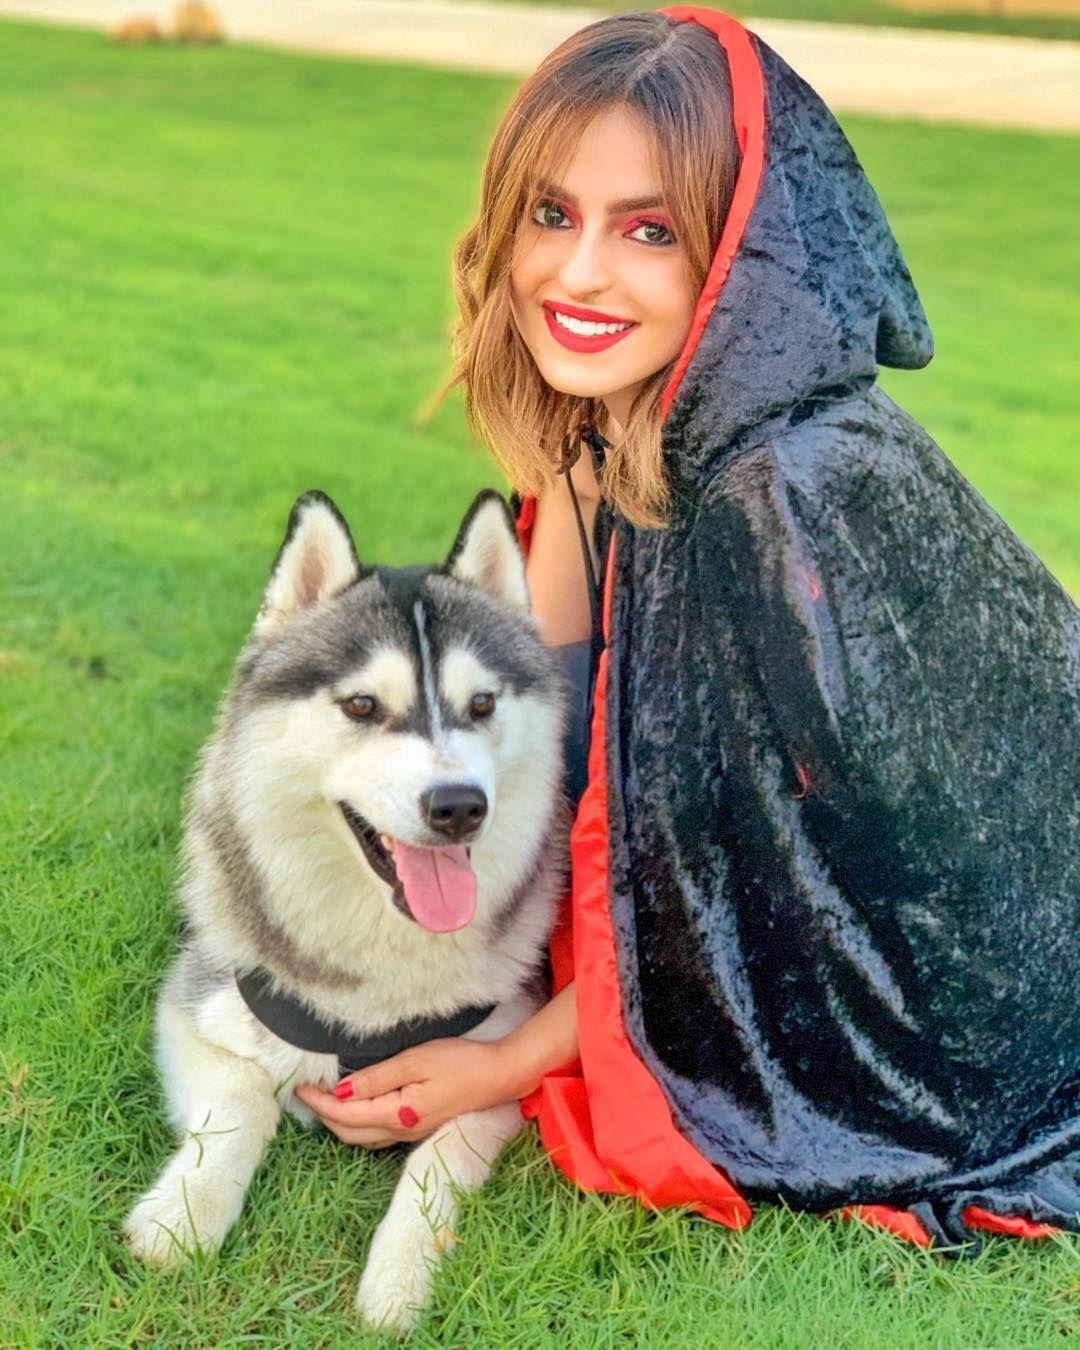 Safa Srour صفا سرور On Instagram Happy Halloween هلوين سعيد للكل من ليلى و الذئب ليو شو كنتو للهلوين هي السنة Halloween Duba Clothes Fashion Dogs